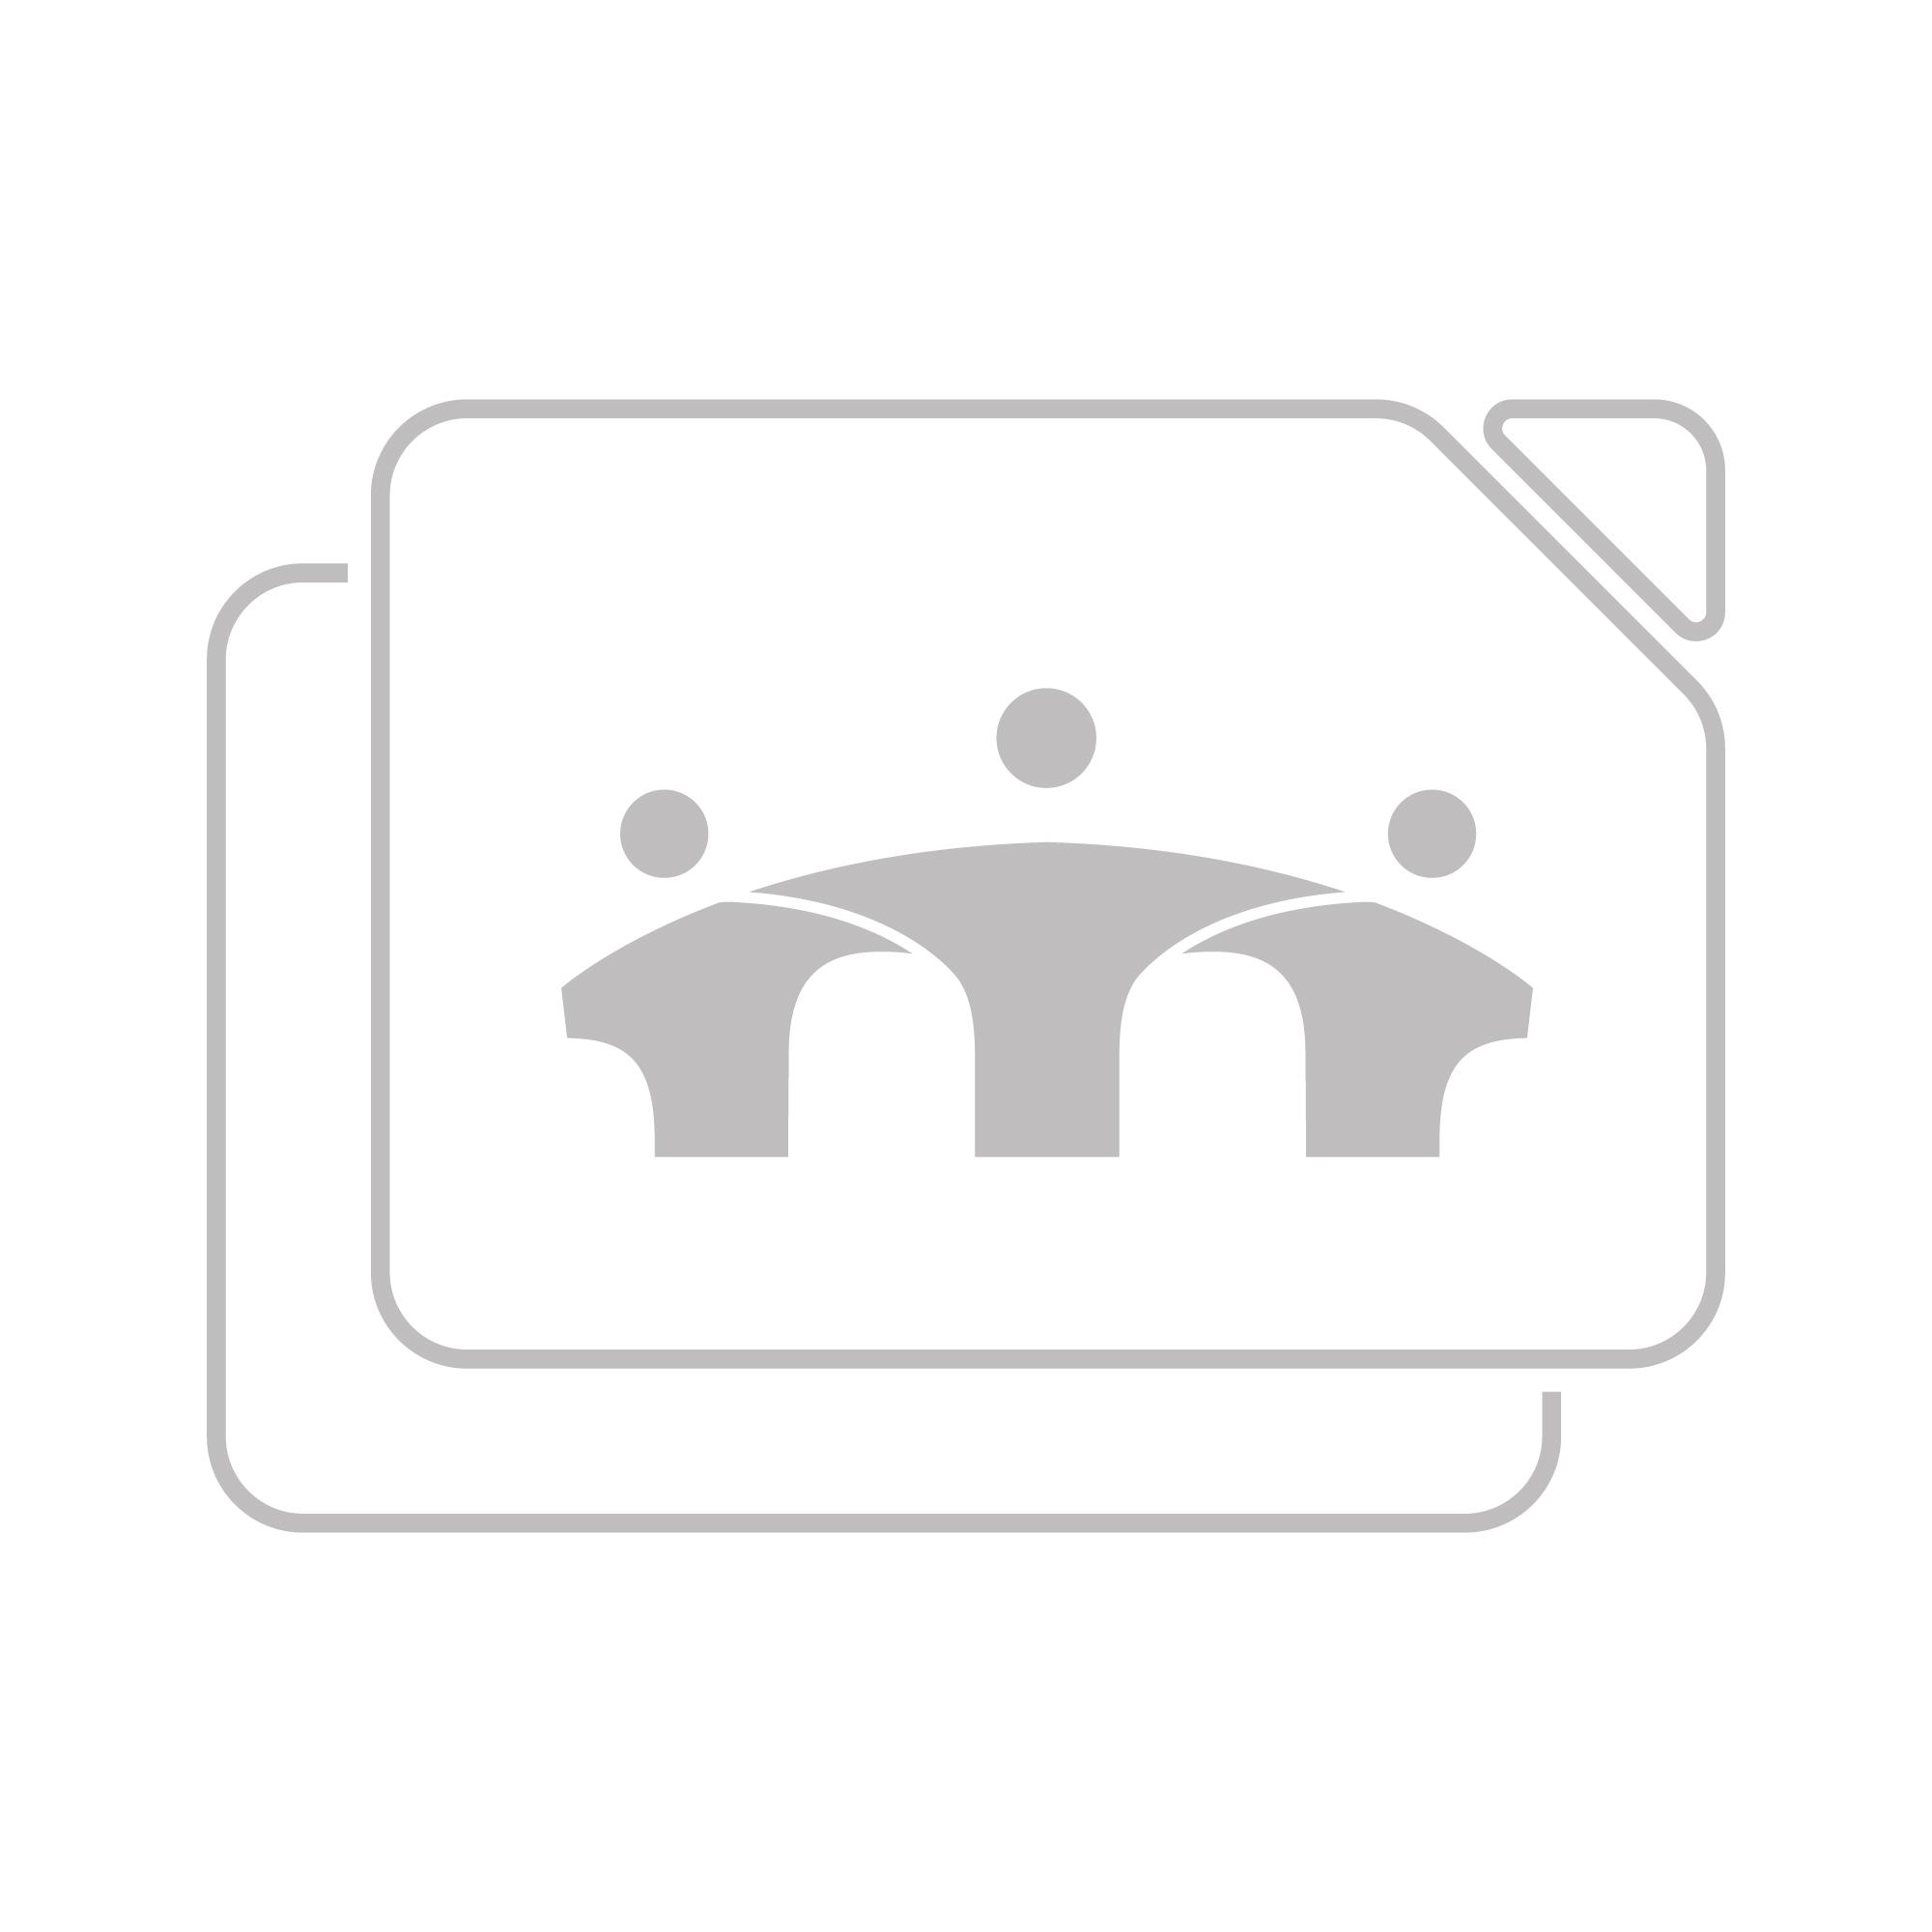 Kingston SSDNow G2 M.2 120GB